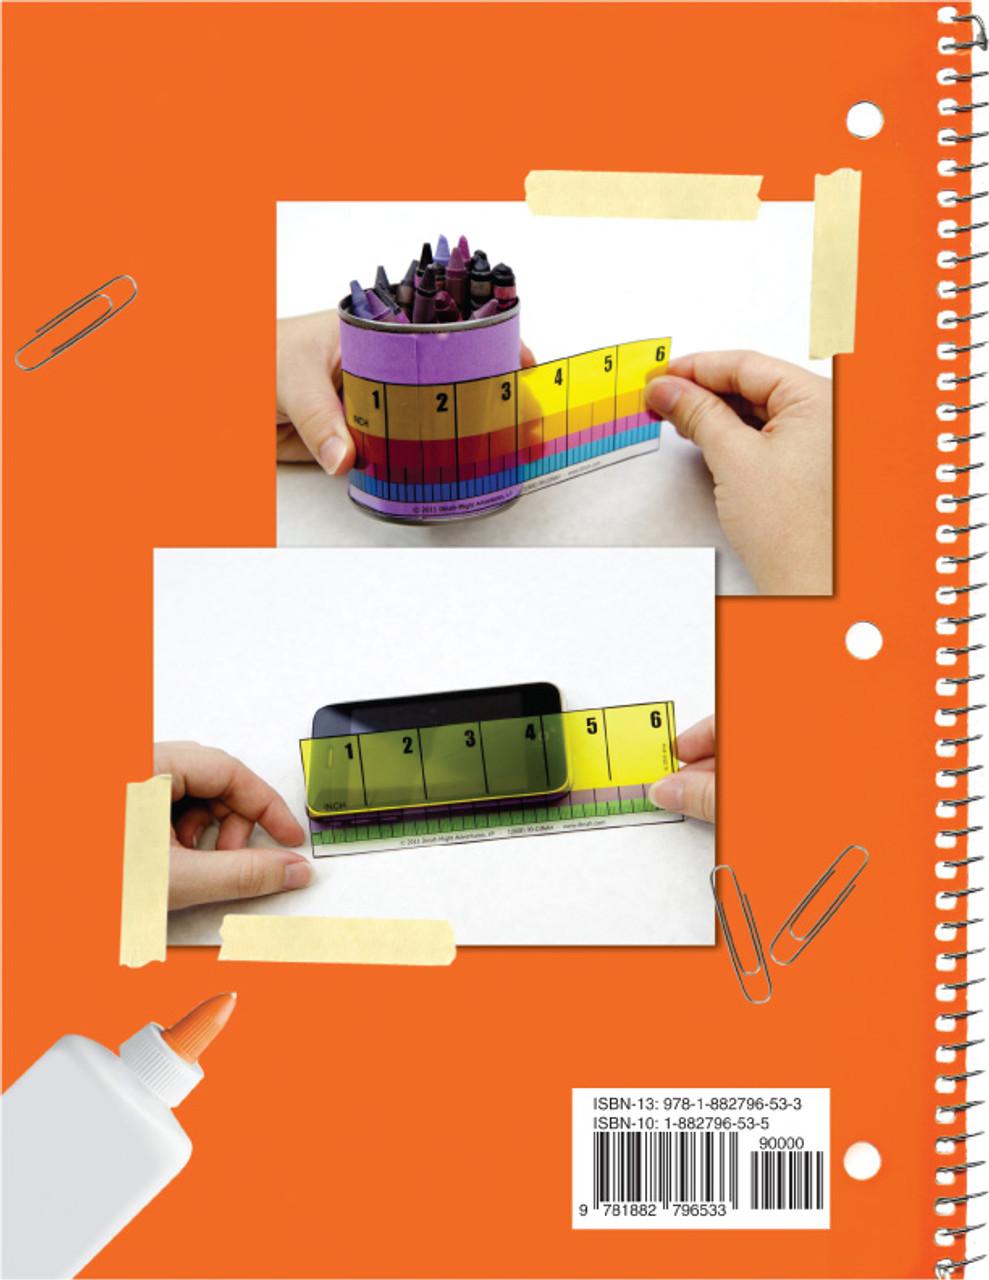 Nc manip rulers jan fc layout 1 (page 01)